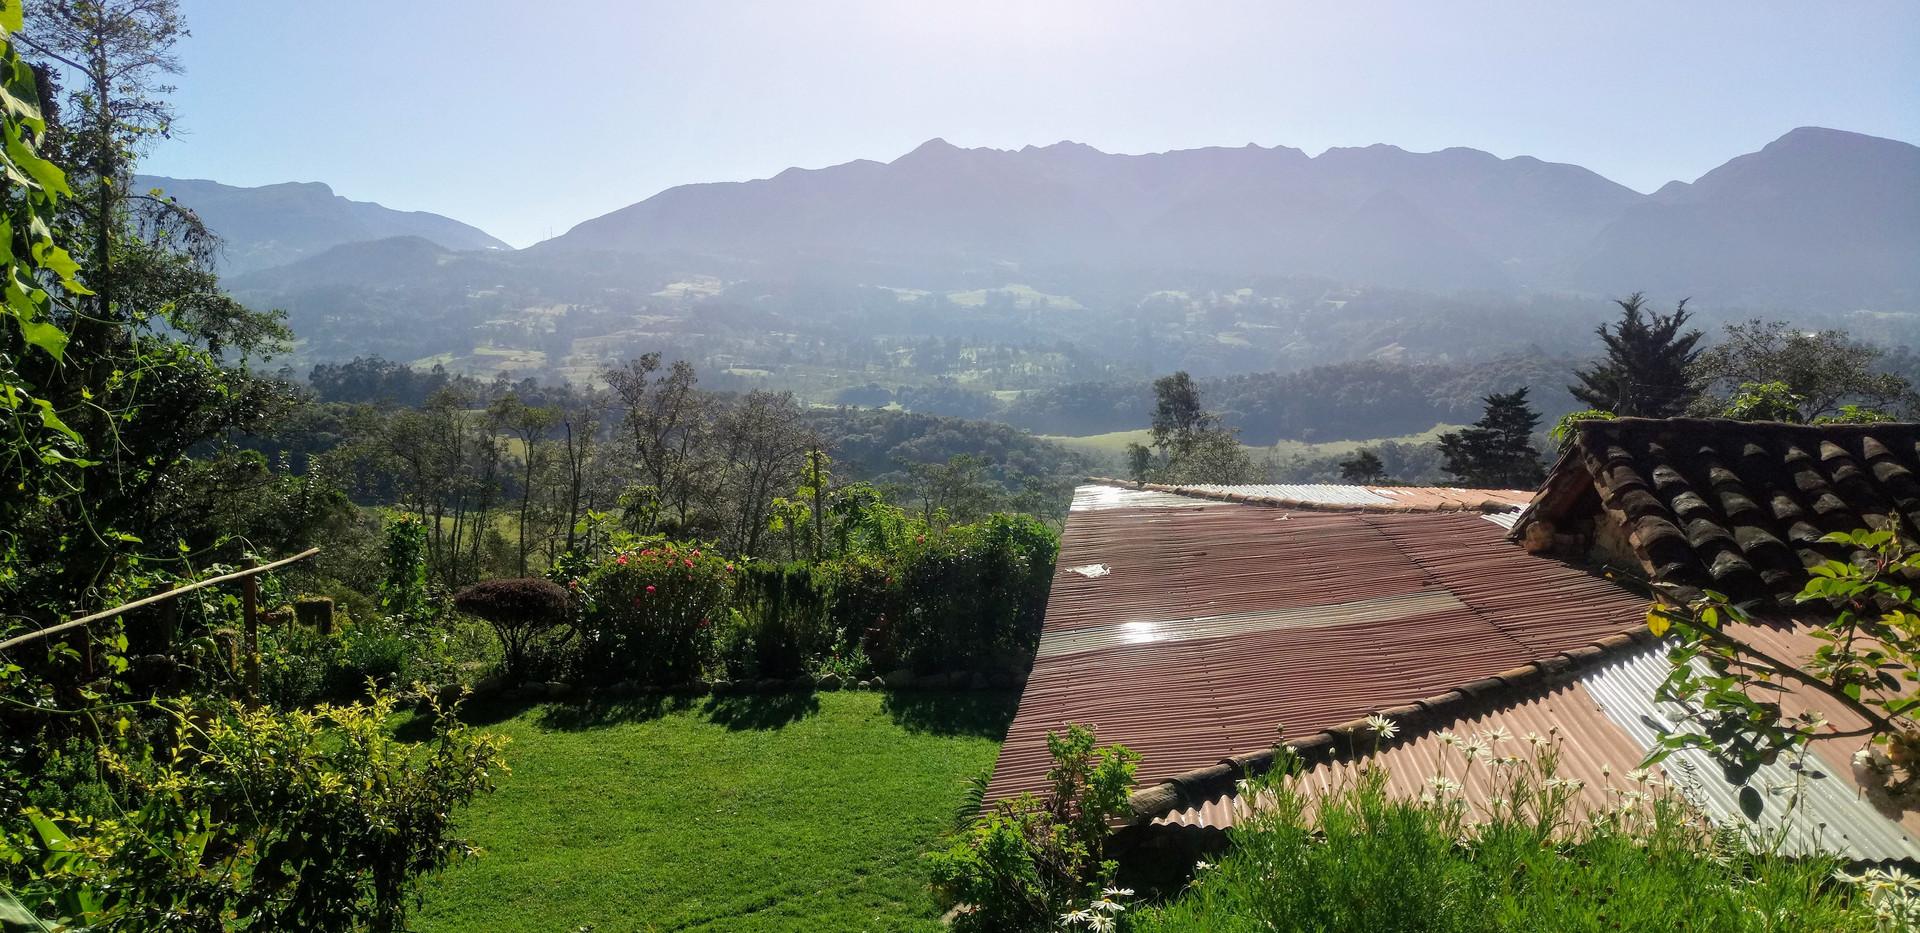 Iguaque view from glamping finca coraz